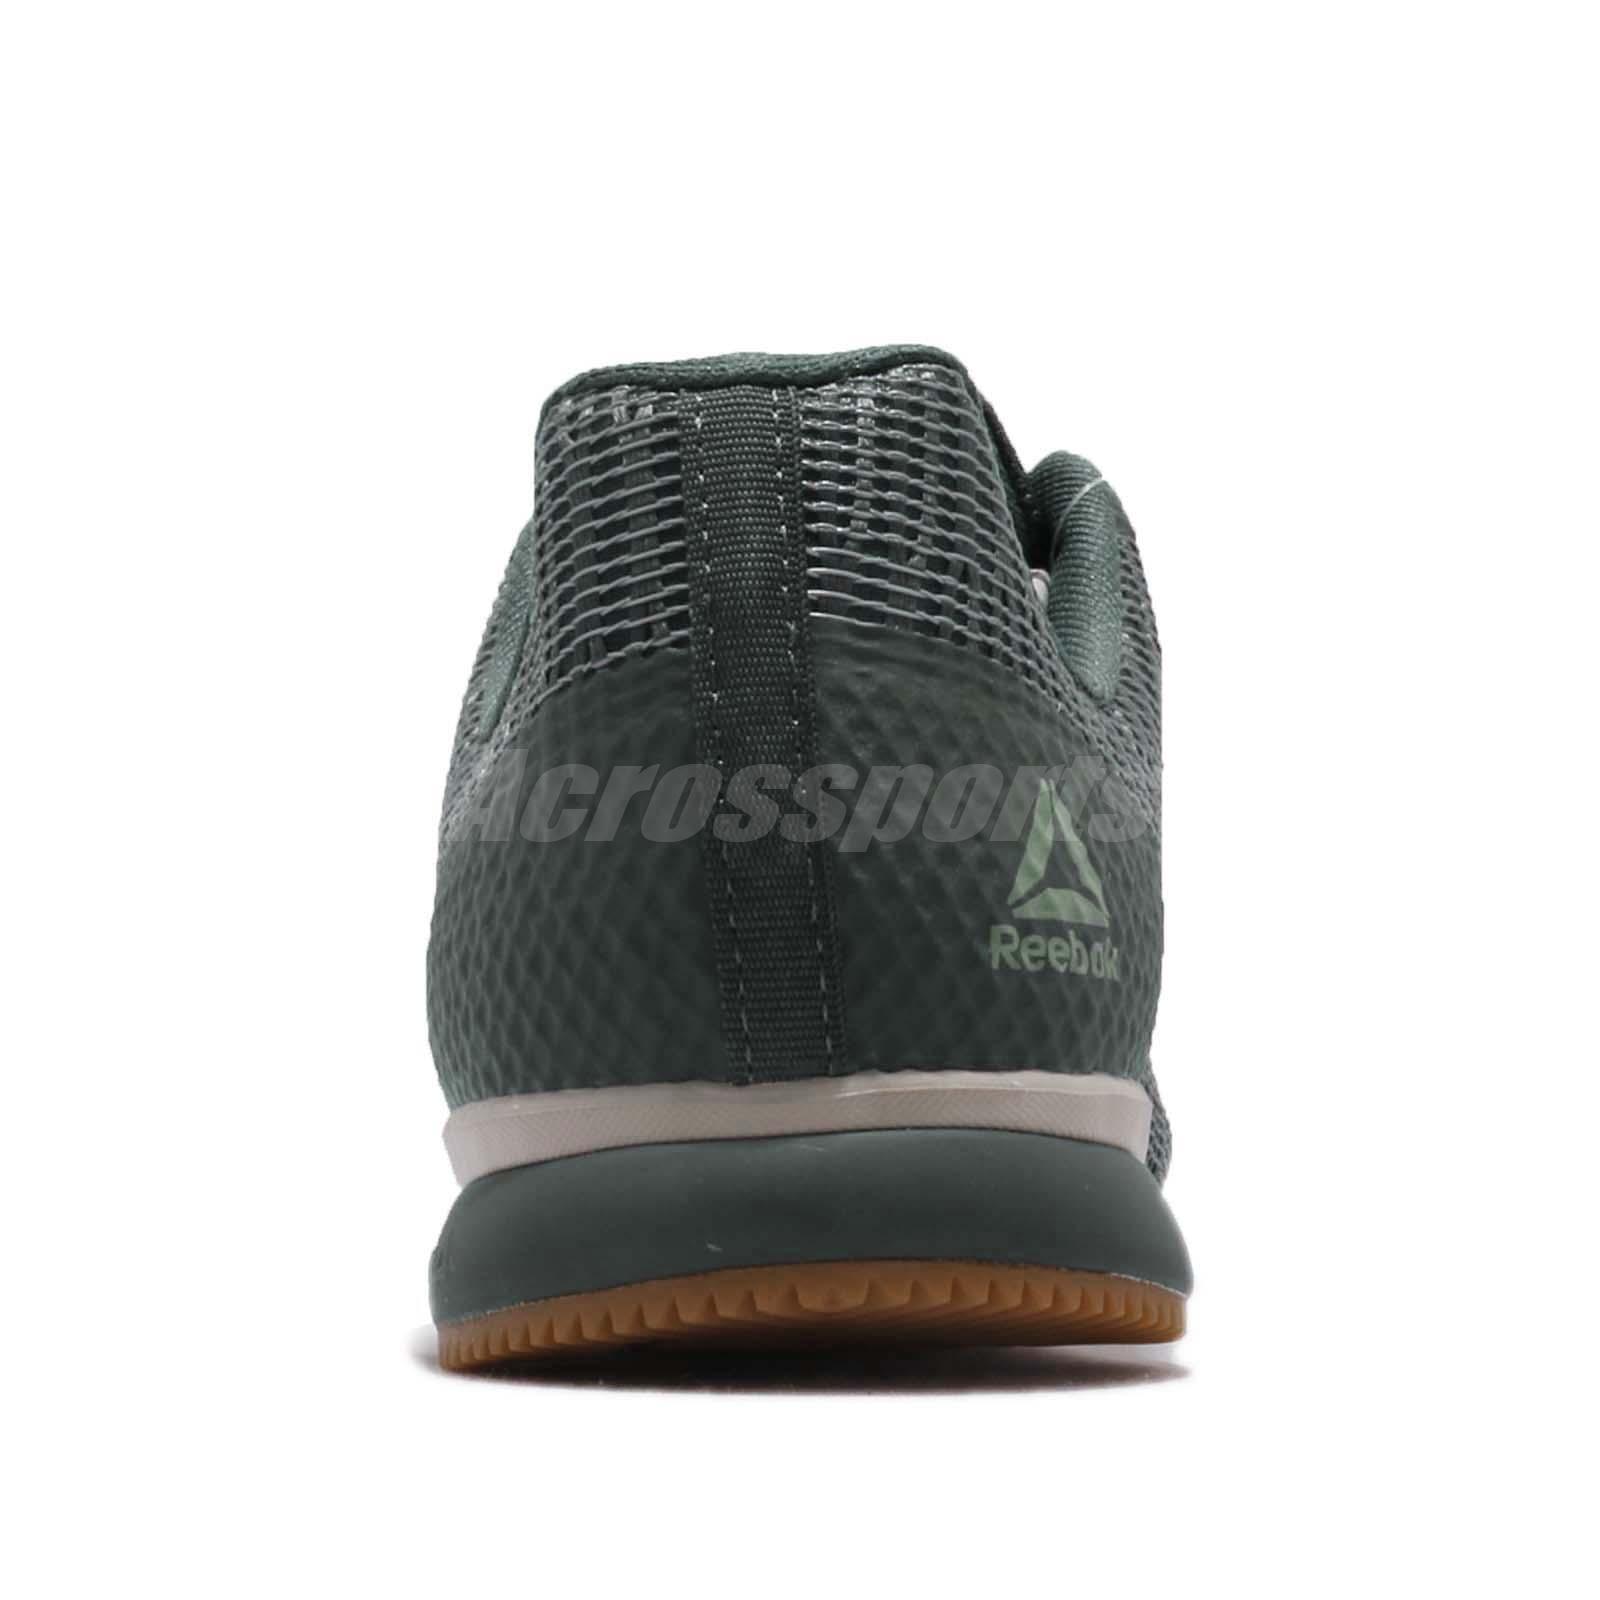 96d639418caaa9 Reebok Speed TR Flexweave Green Gum Men Cross Training Shoes ...